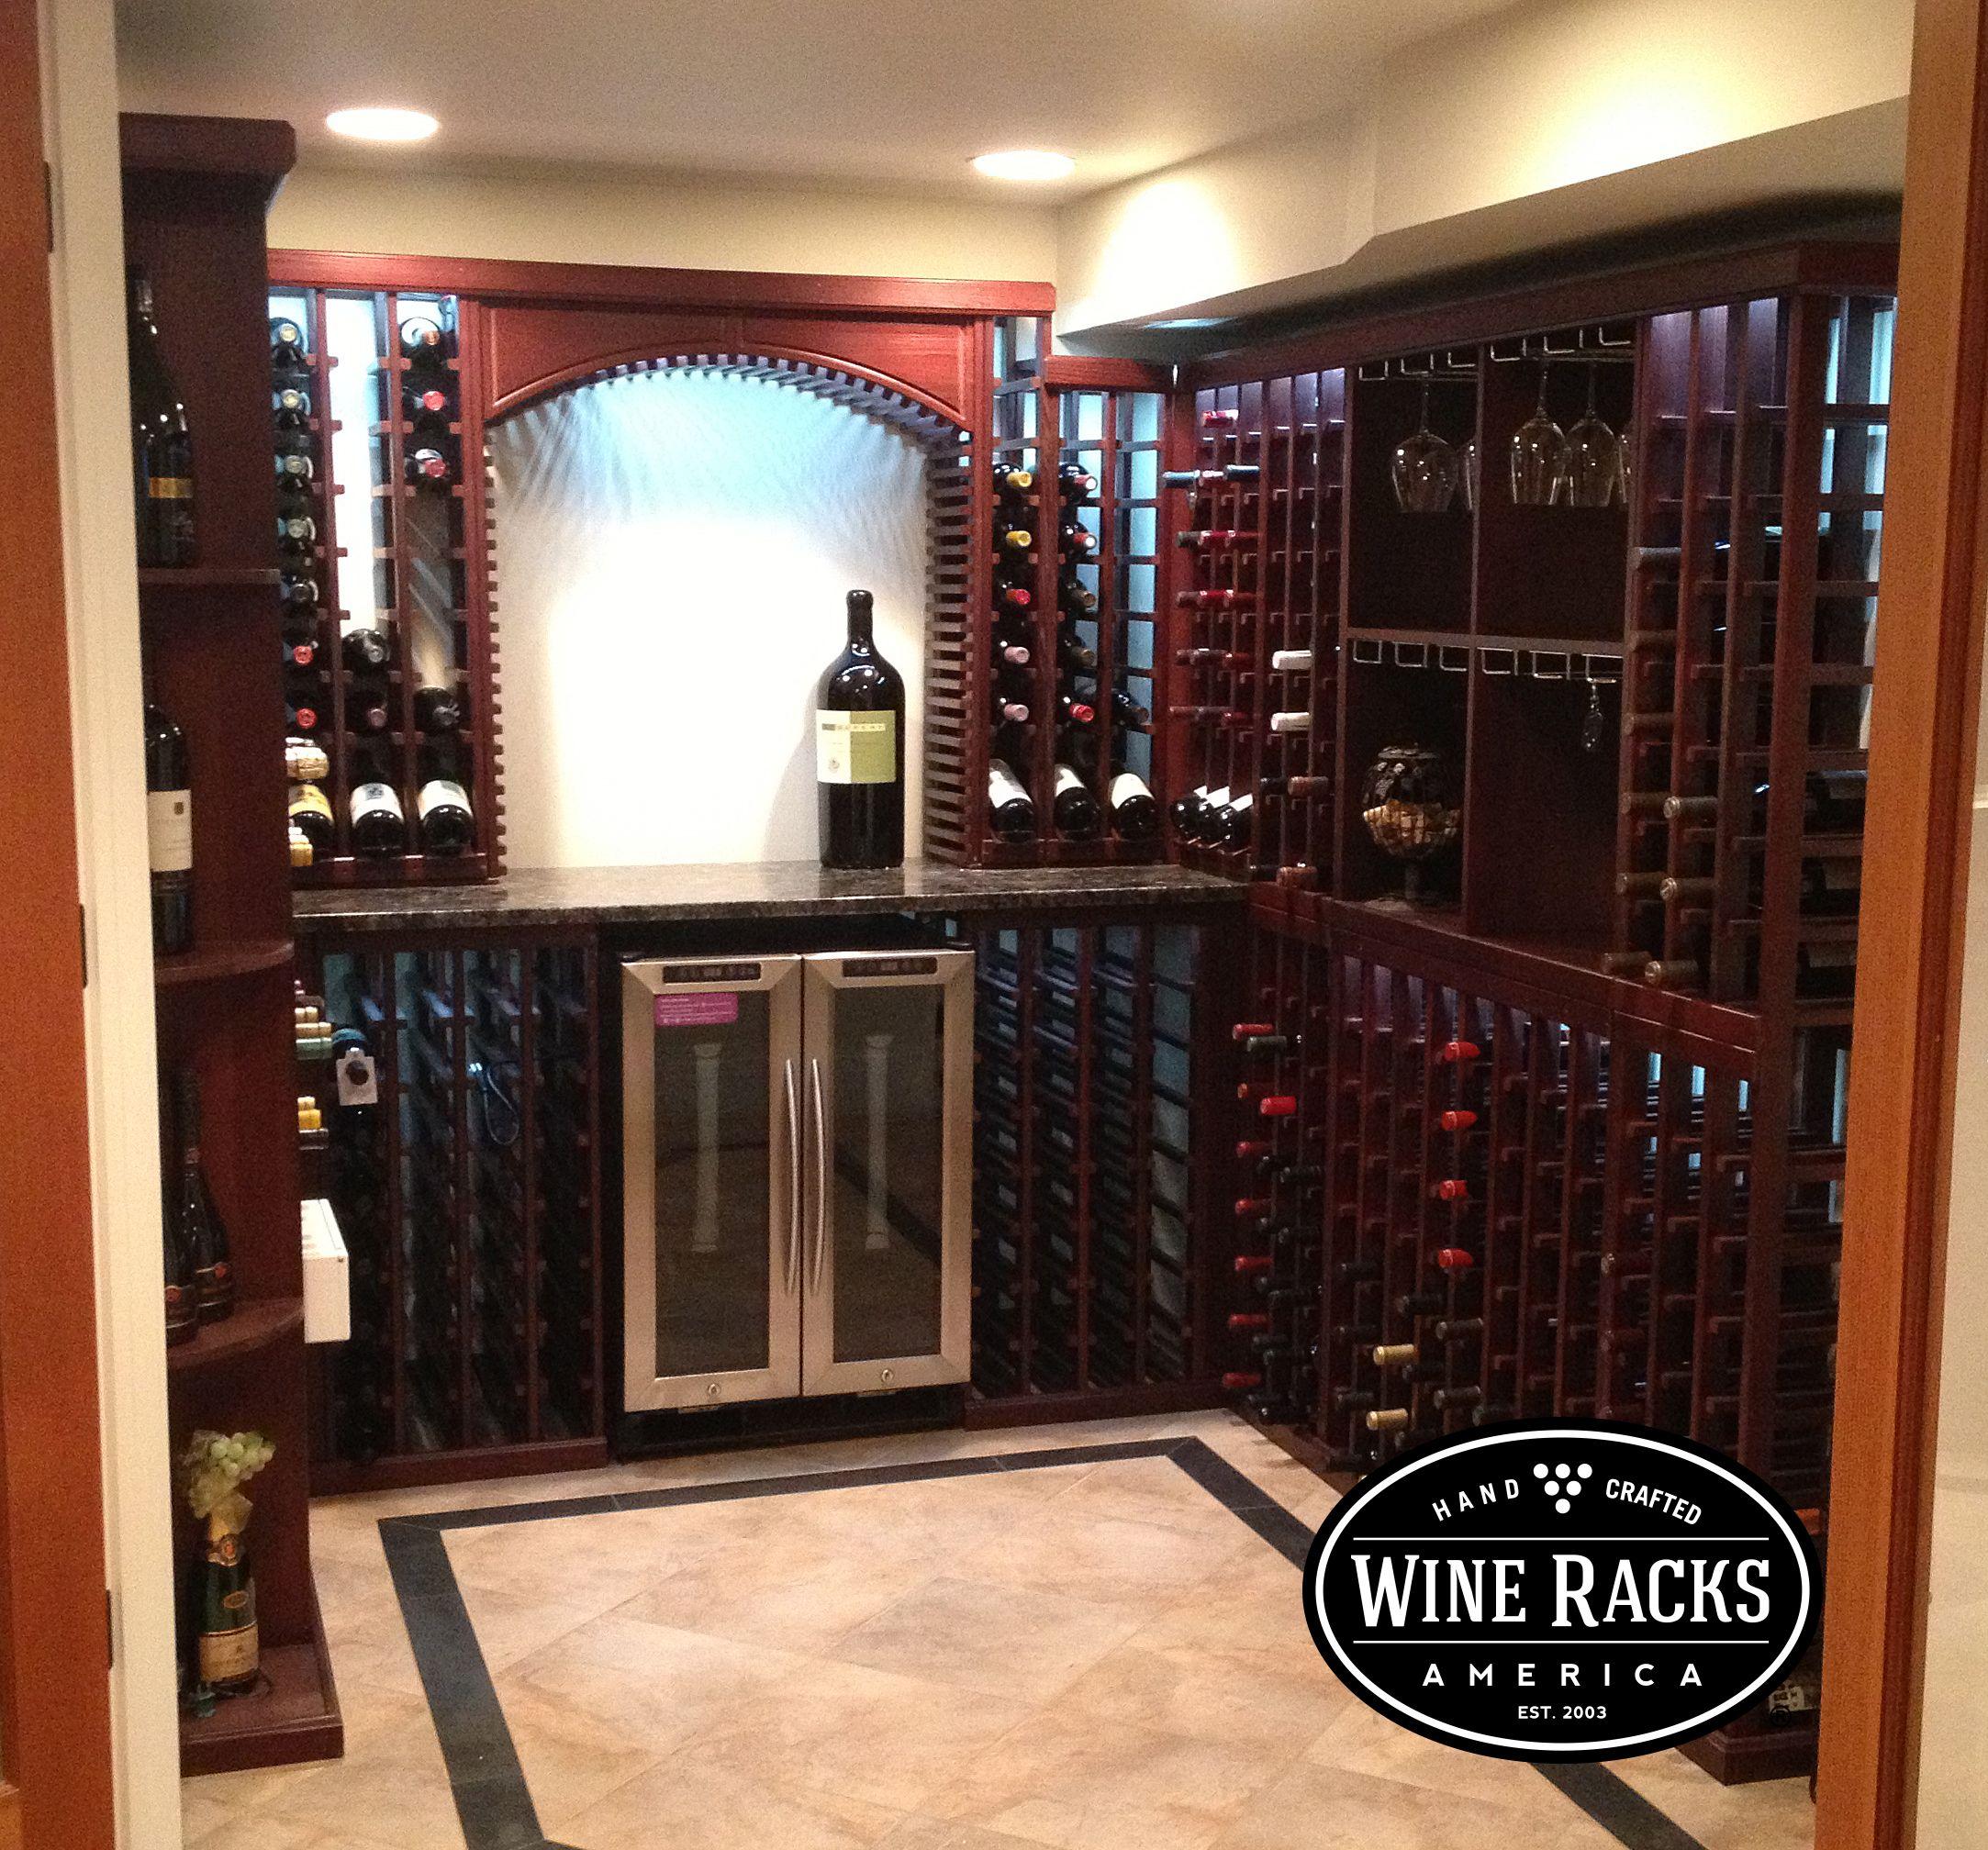 Wine Cellar Racks By Instacellar Build Your Own Wine Rack System With Diy Rack Kits Wine Racks America Wine Cellar Racks Wine Cellar Design Wine Cellar